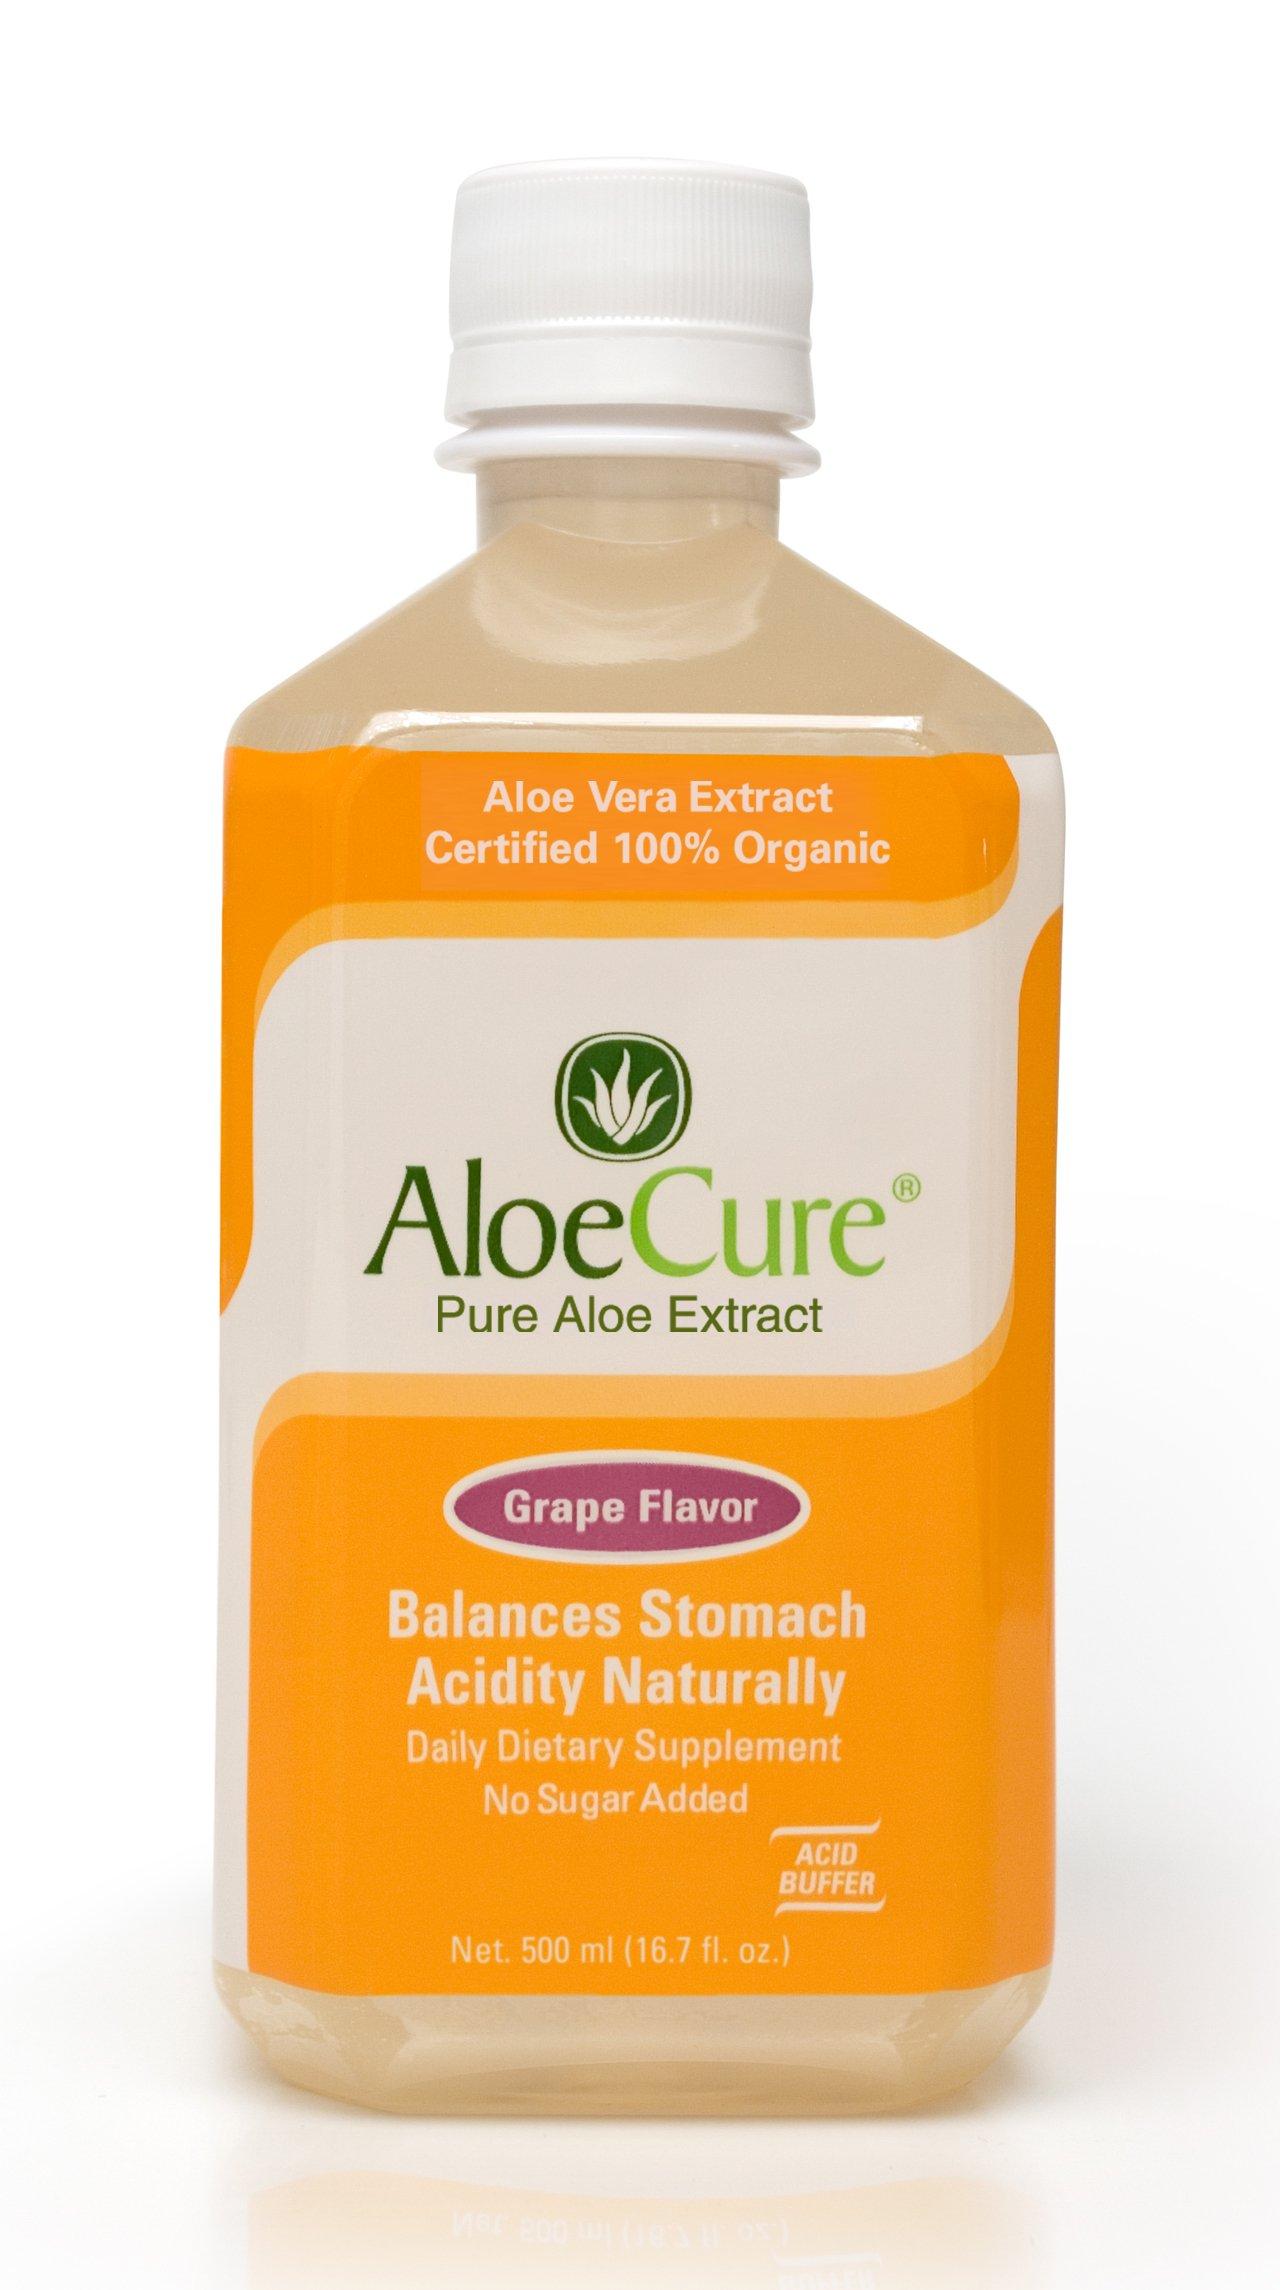 AloeCure Pure Aloe Vera Juice for Bouts of Acid Reflux, Heartburn, and IBS - Grape,18